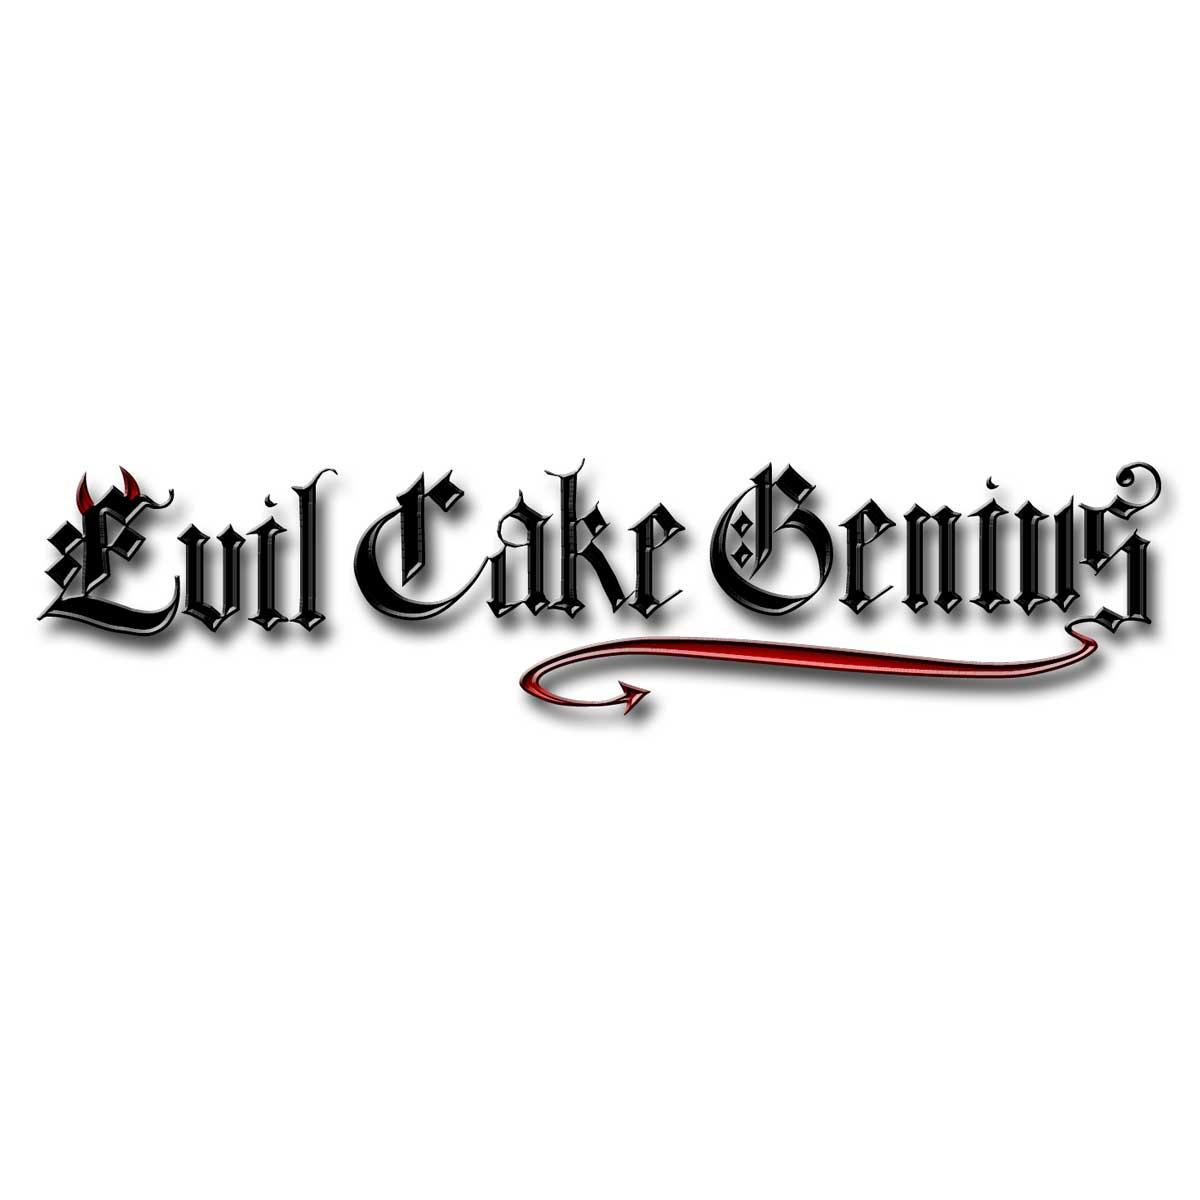 Eiffel Tower Mesh Stencil  Evil Cake Genius